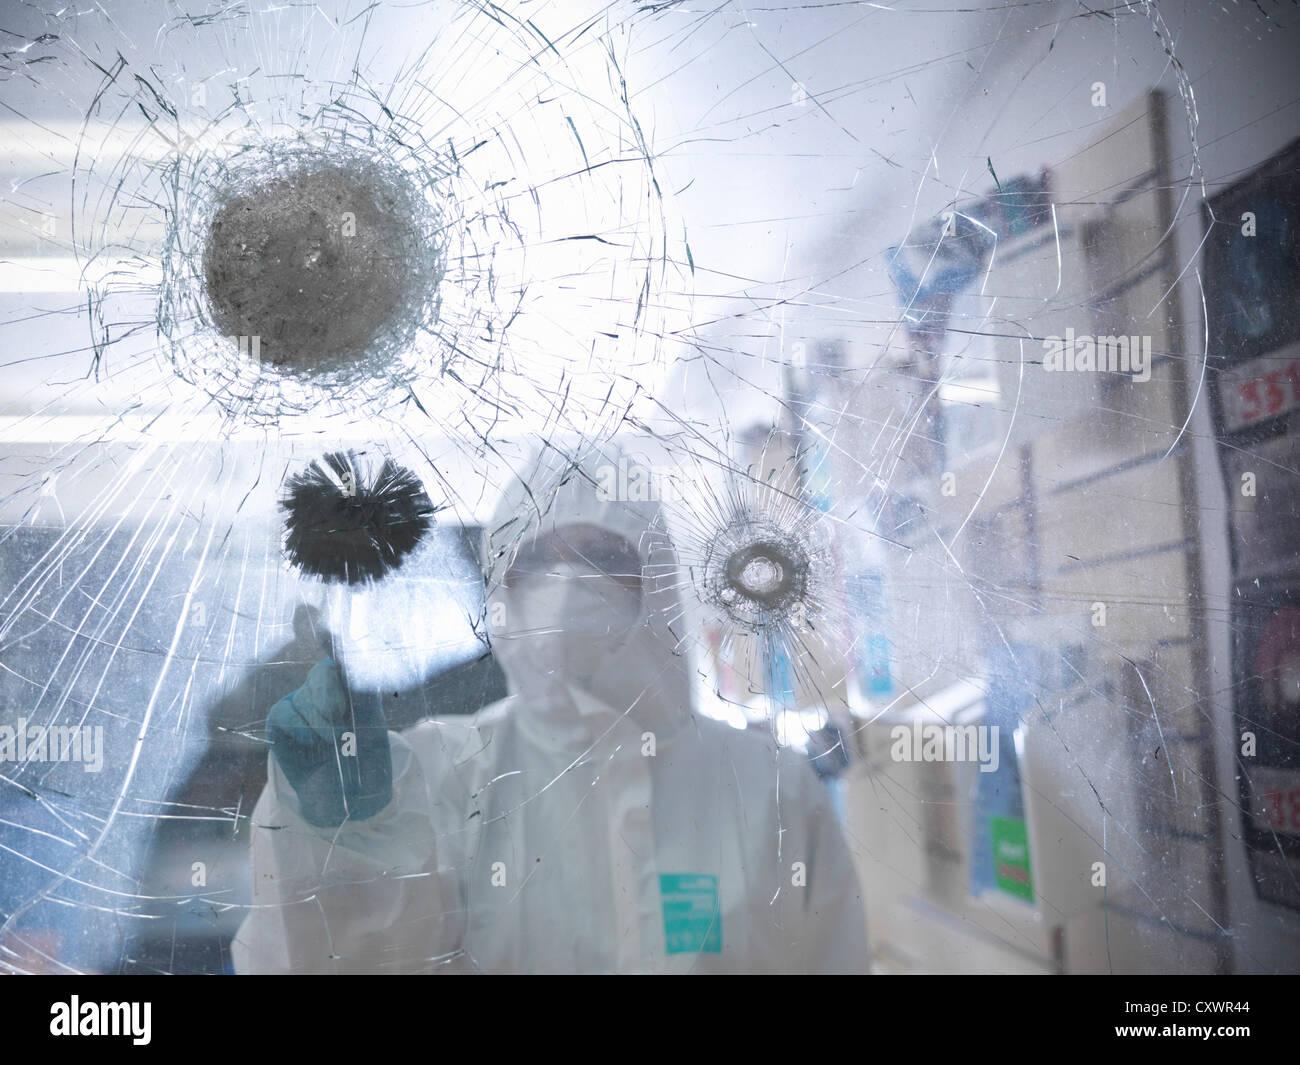 Forensische Wissenschaftler am zerbrochenen Fenster Stockbild